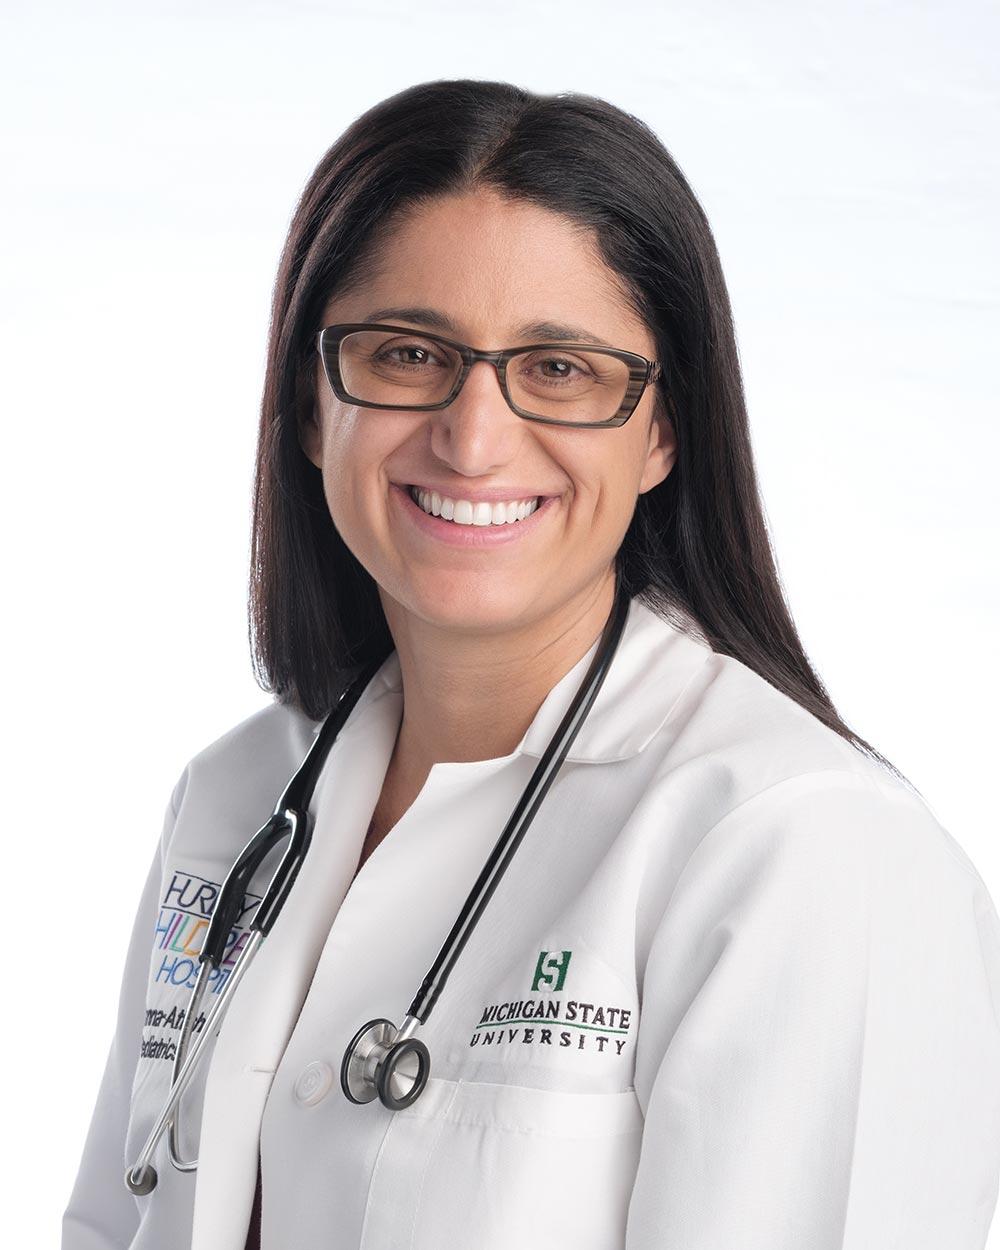 A portrait of Dr. Mona Hanna-Attisha in a lab coat.